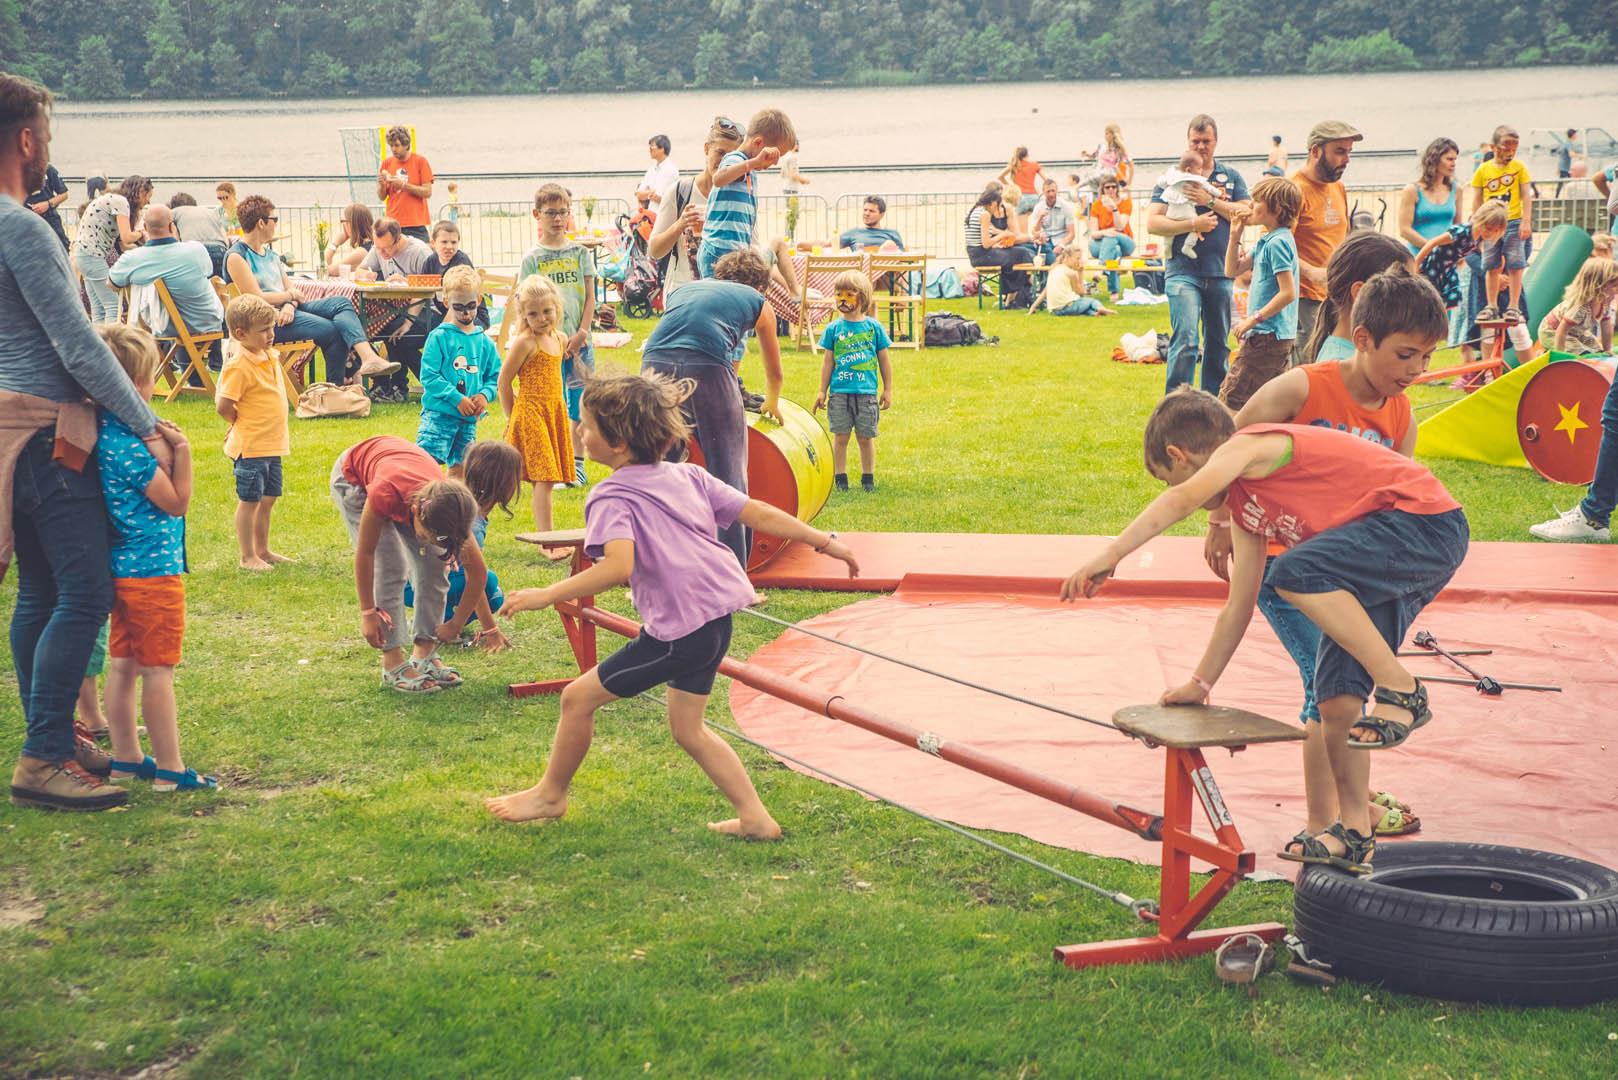 Stad Gent Picknick Event Randanimatie